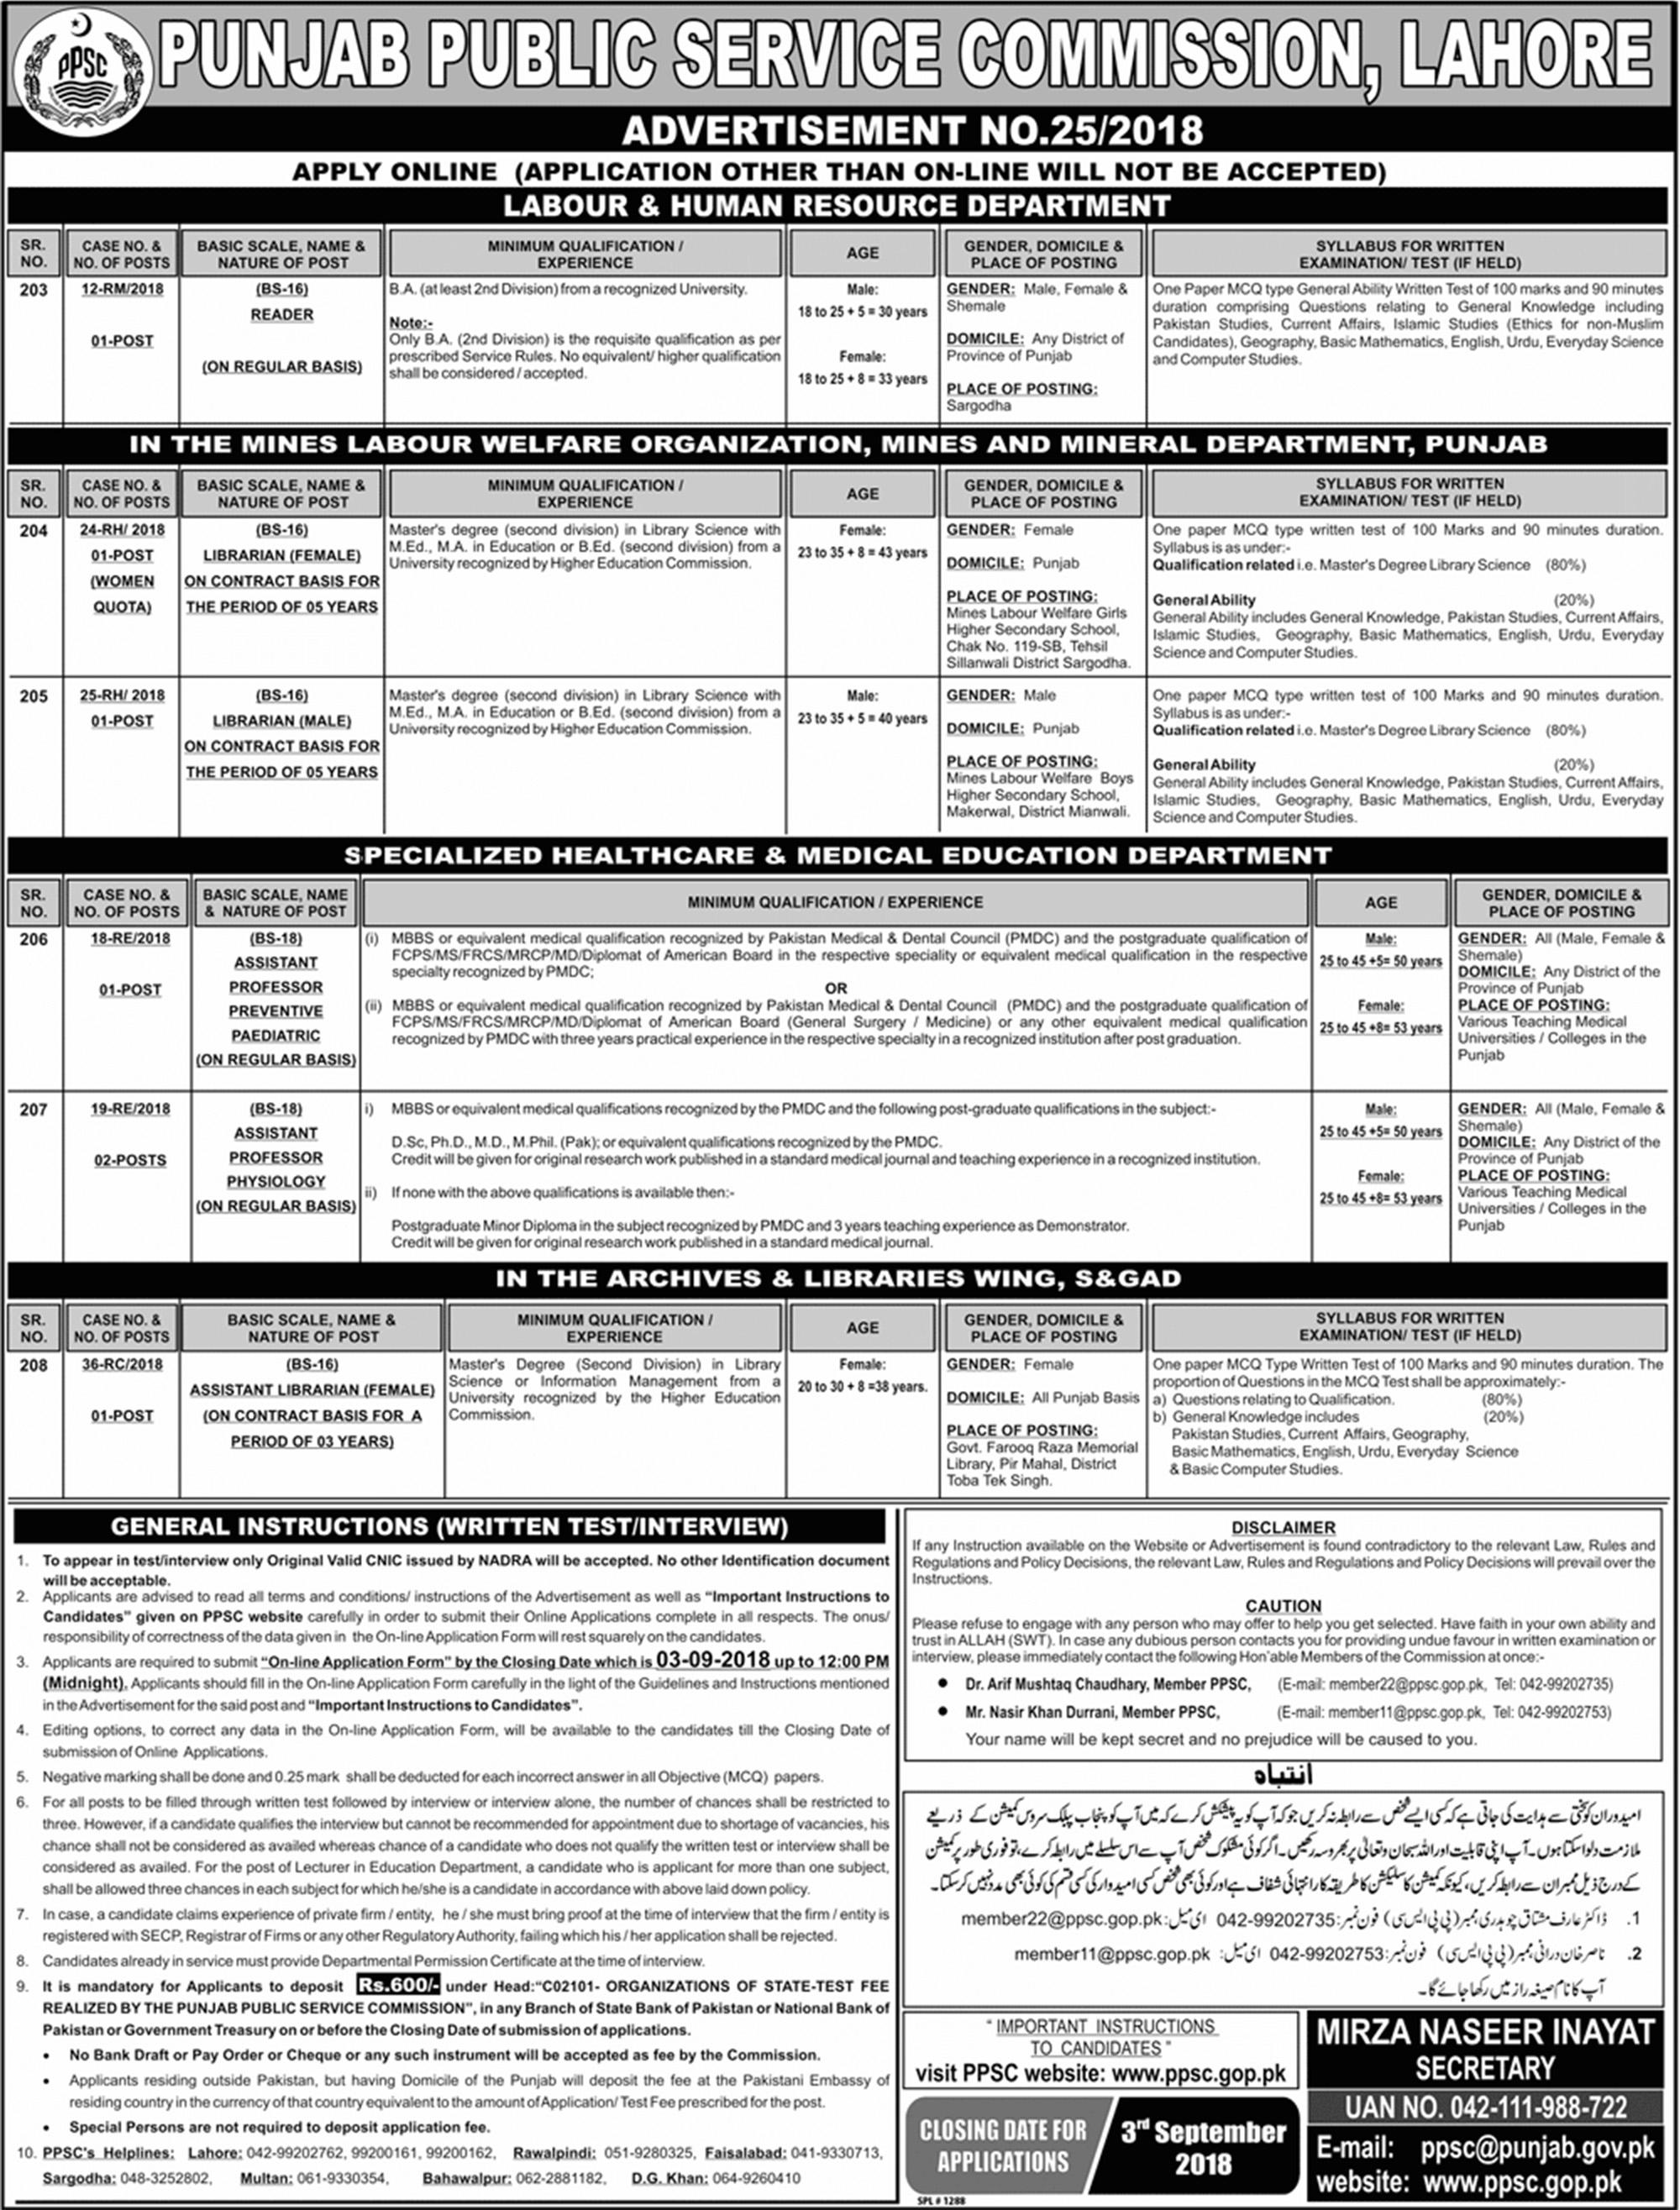 PPSC Jobs Advertisement No. 25/2018 Apply Online Last Date